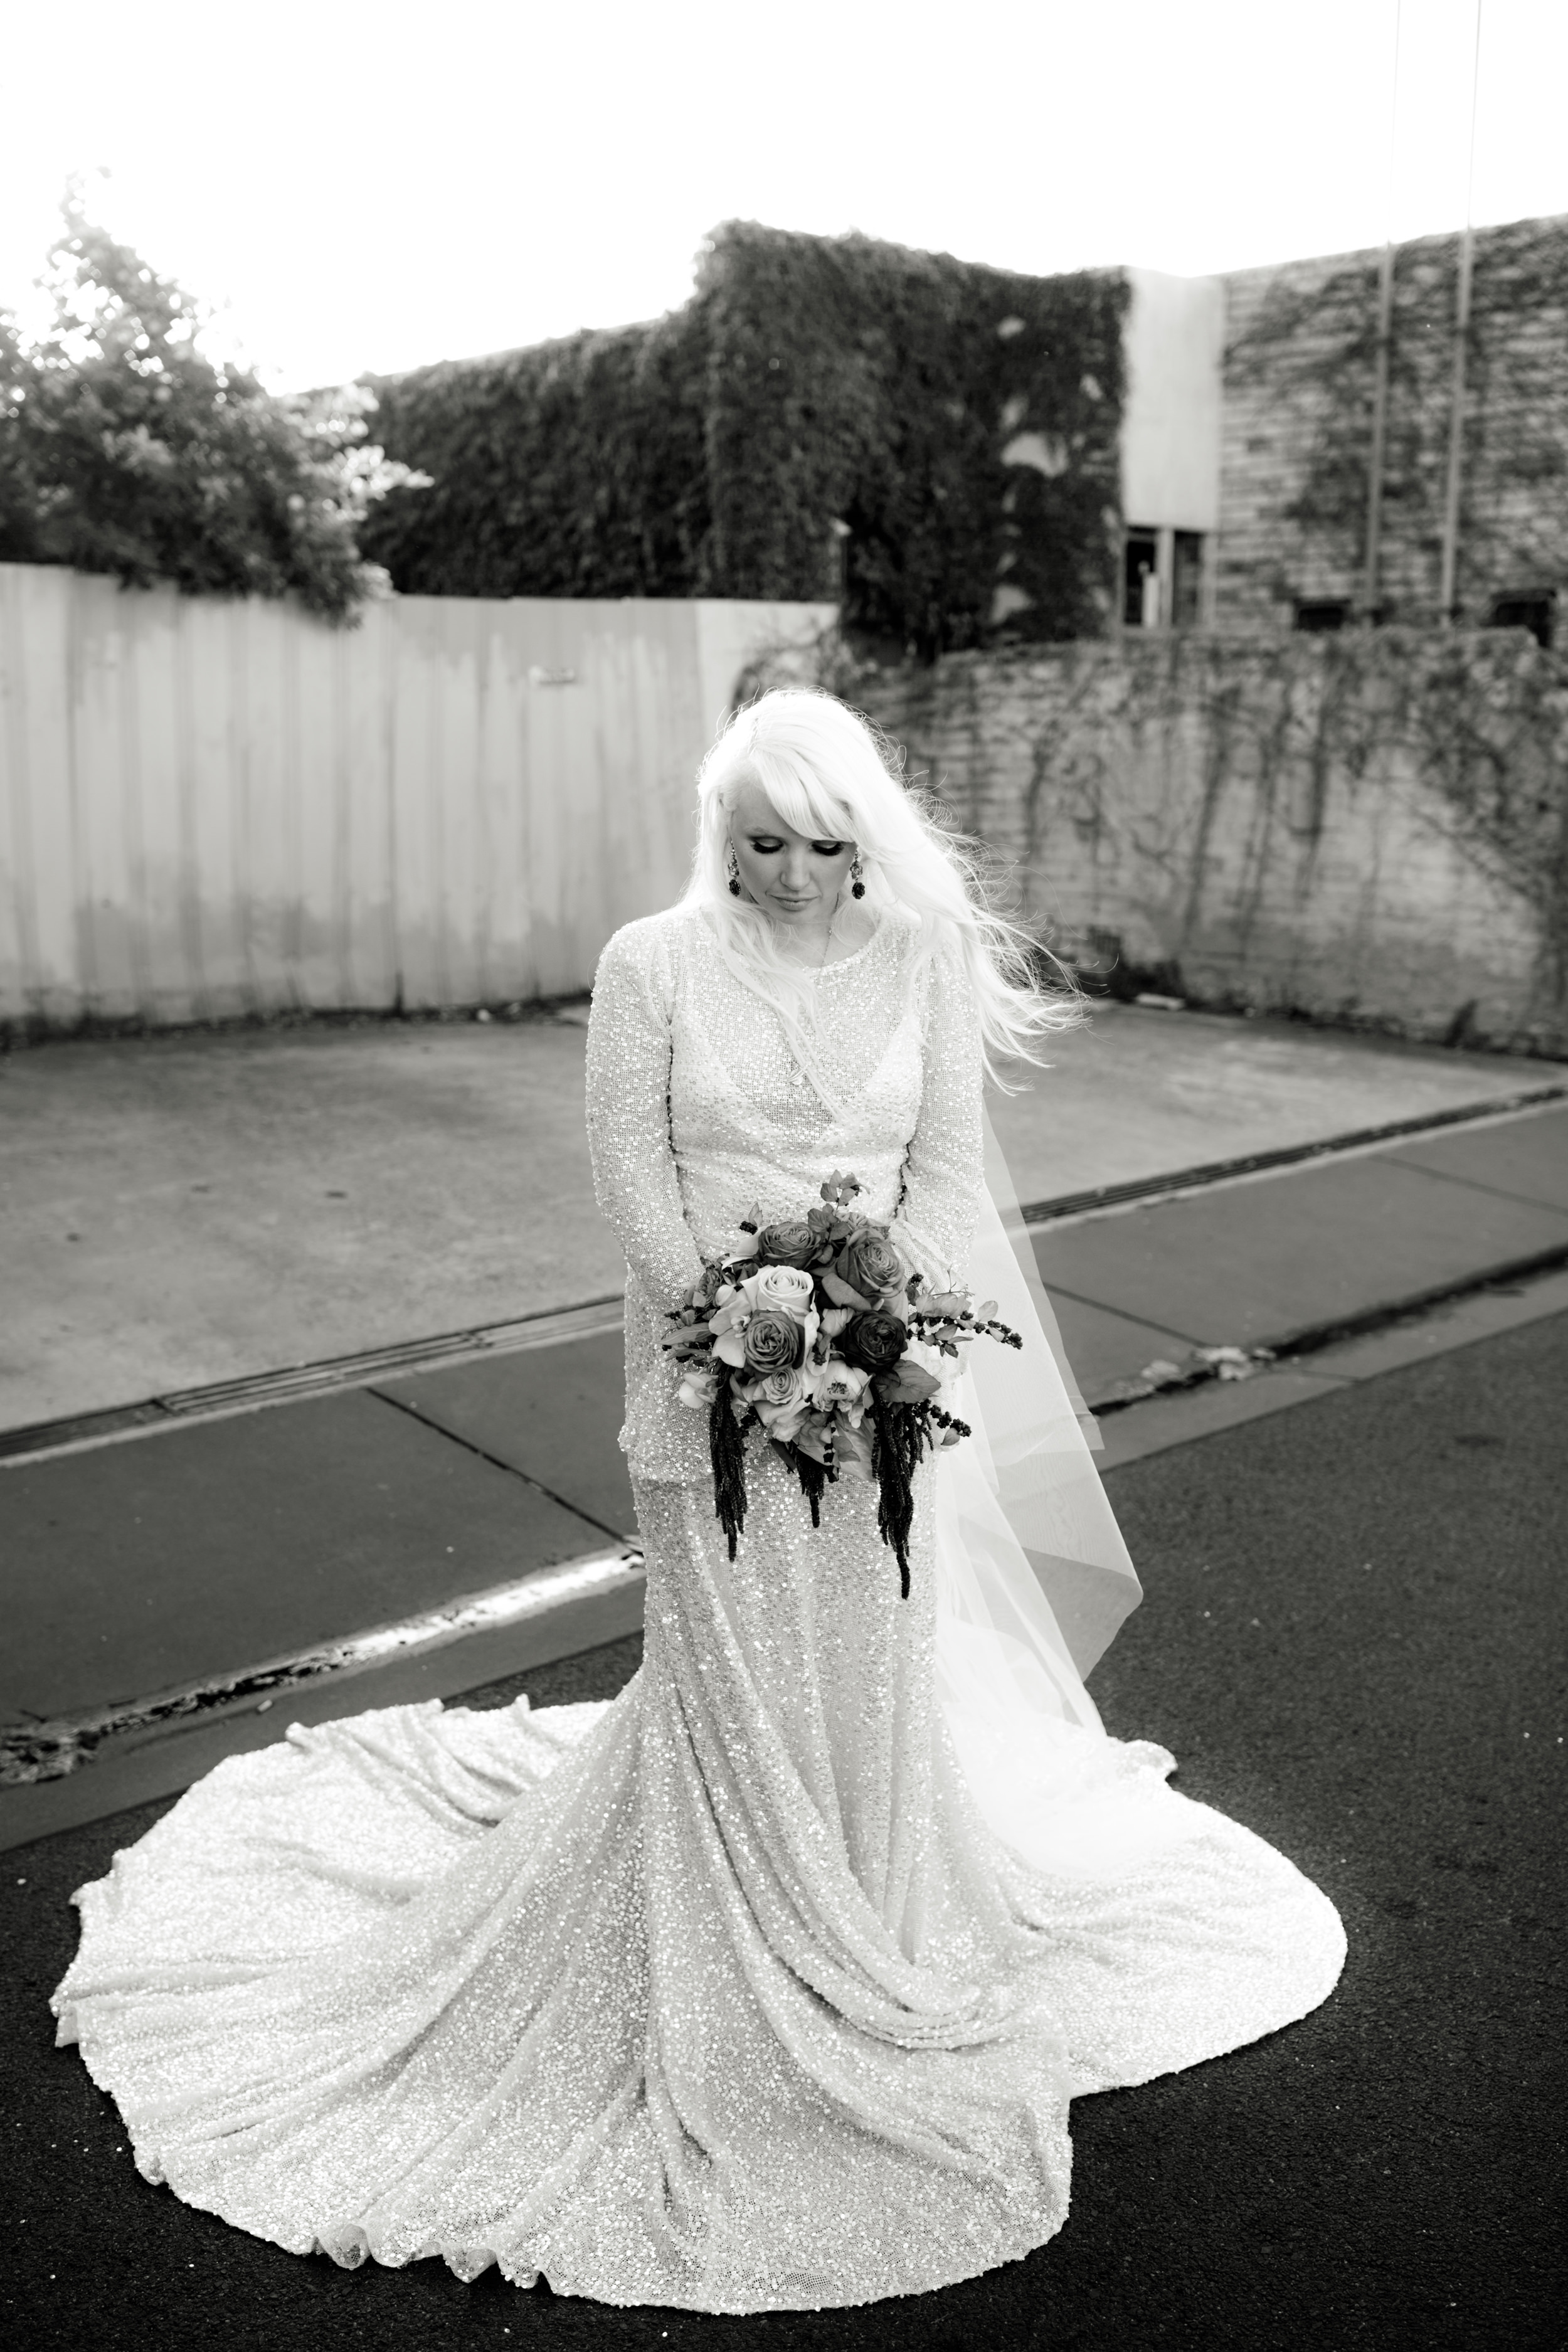 I-Got-You-Babe-Weddings-Tori-Will-Rupert0085.JPG